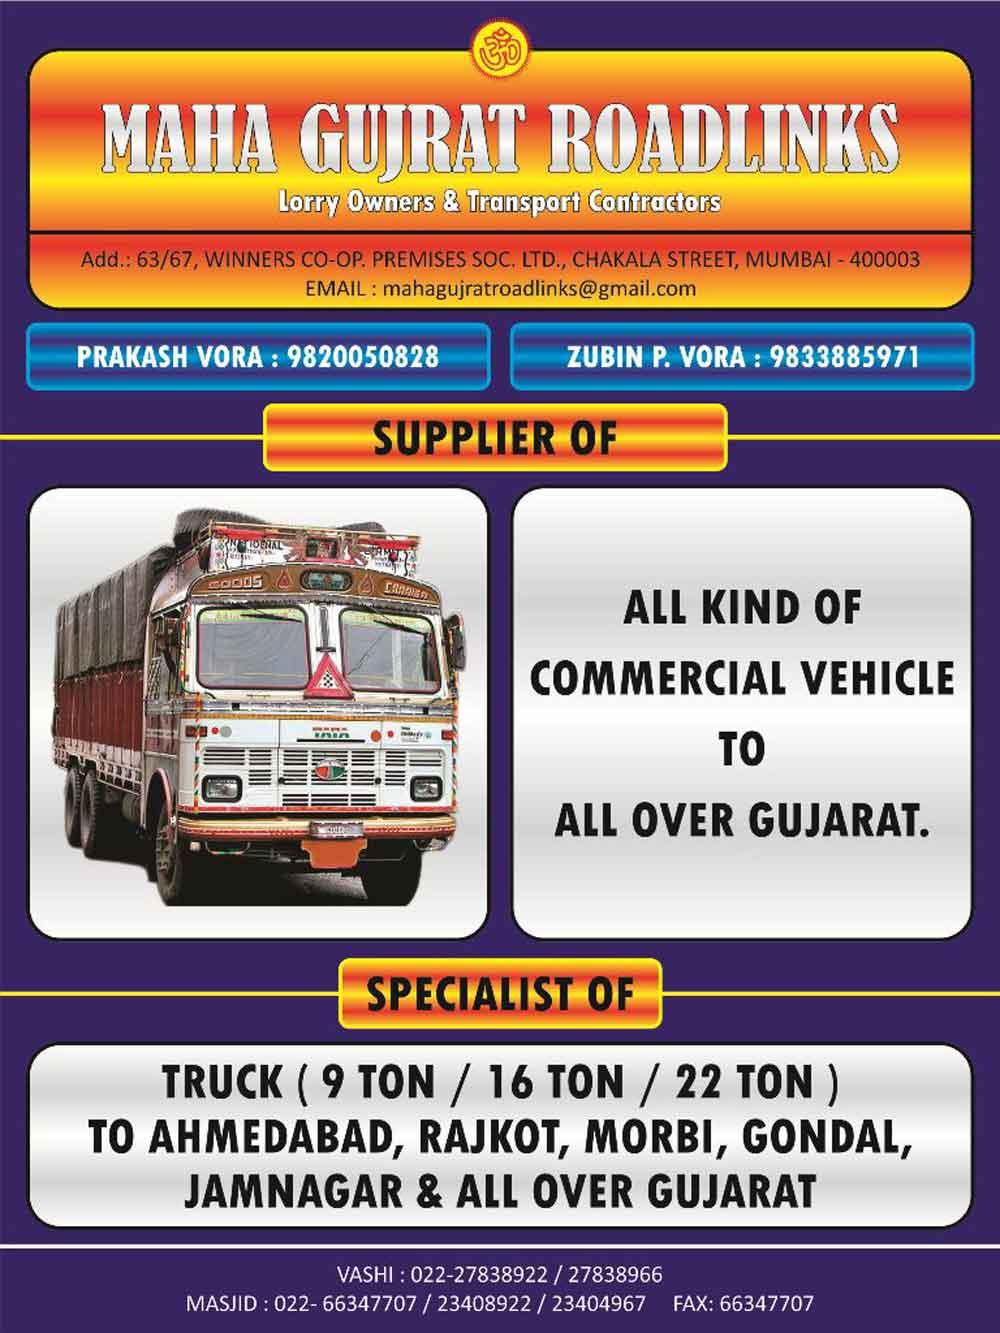 Maha Gujarat Roadlinks